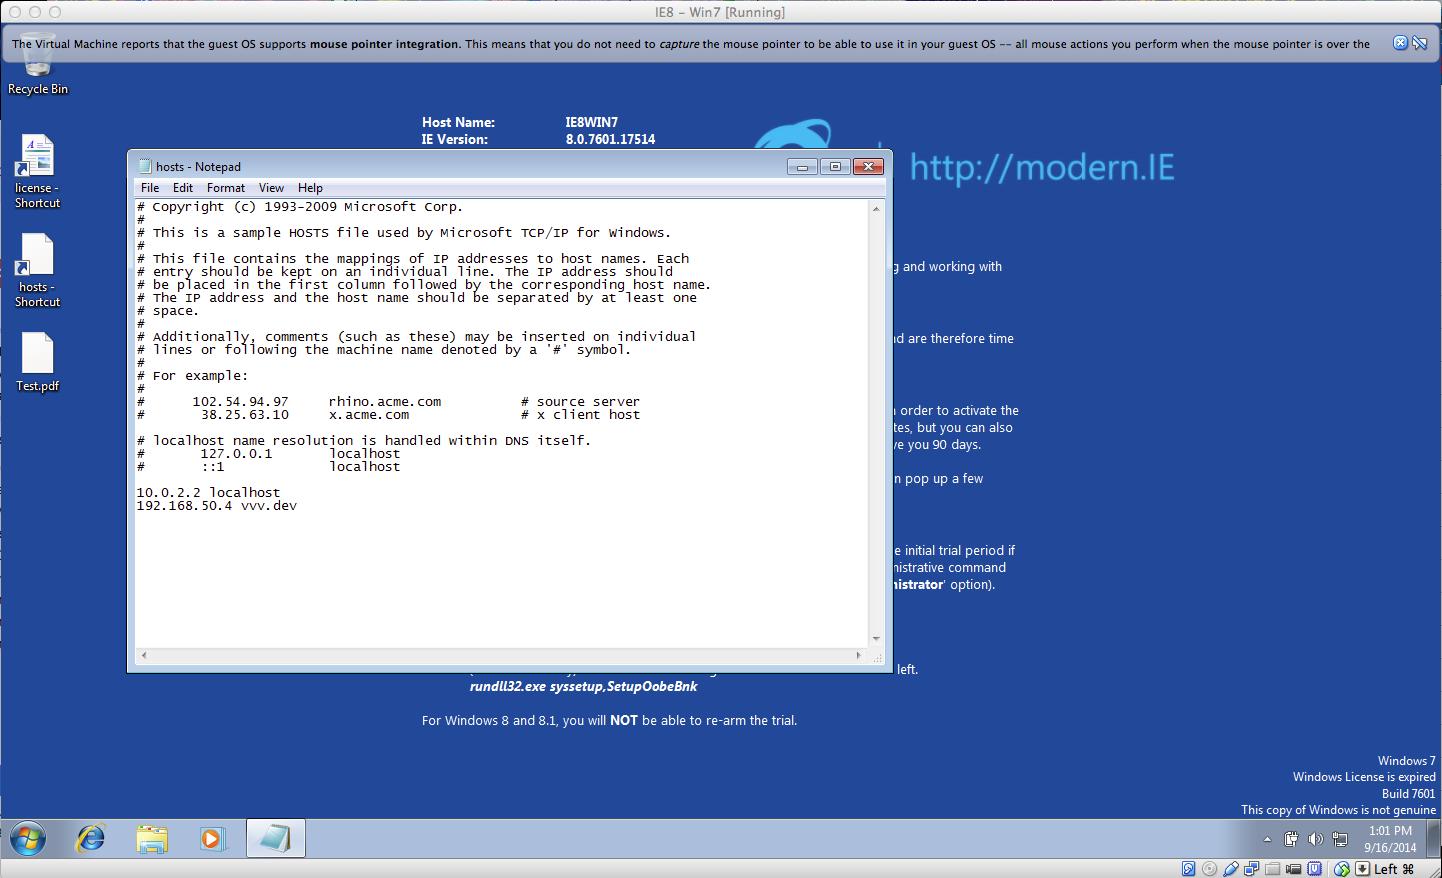 Editing Hosts File On An Ie Virtual Machine Maura Teal